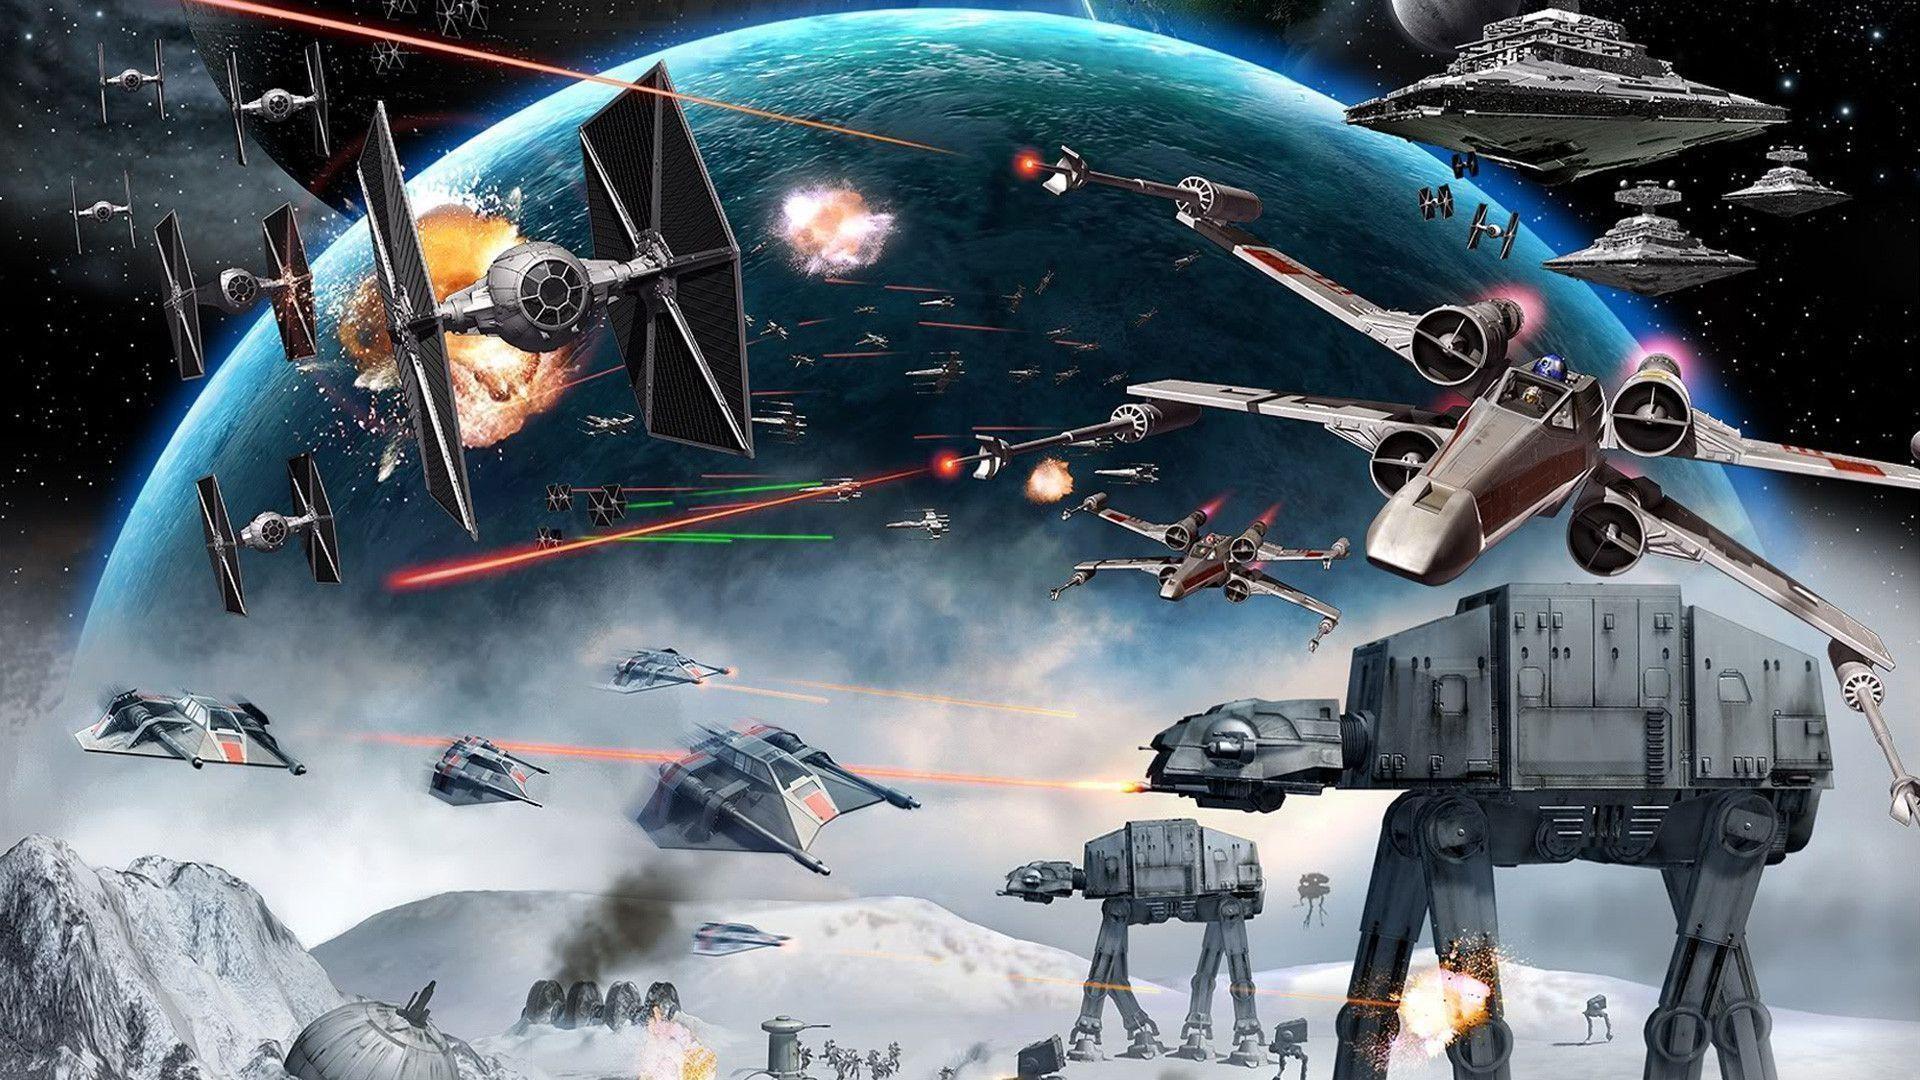 Star Wars Wallpapers 1080p! – Taringa!